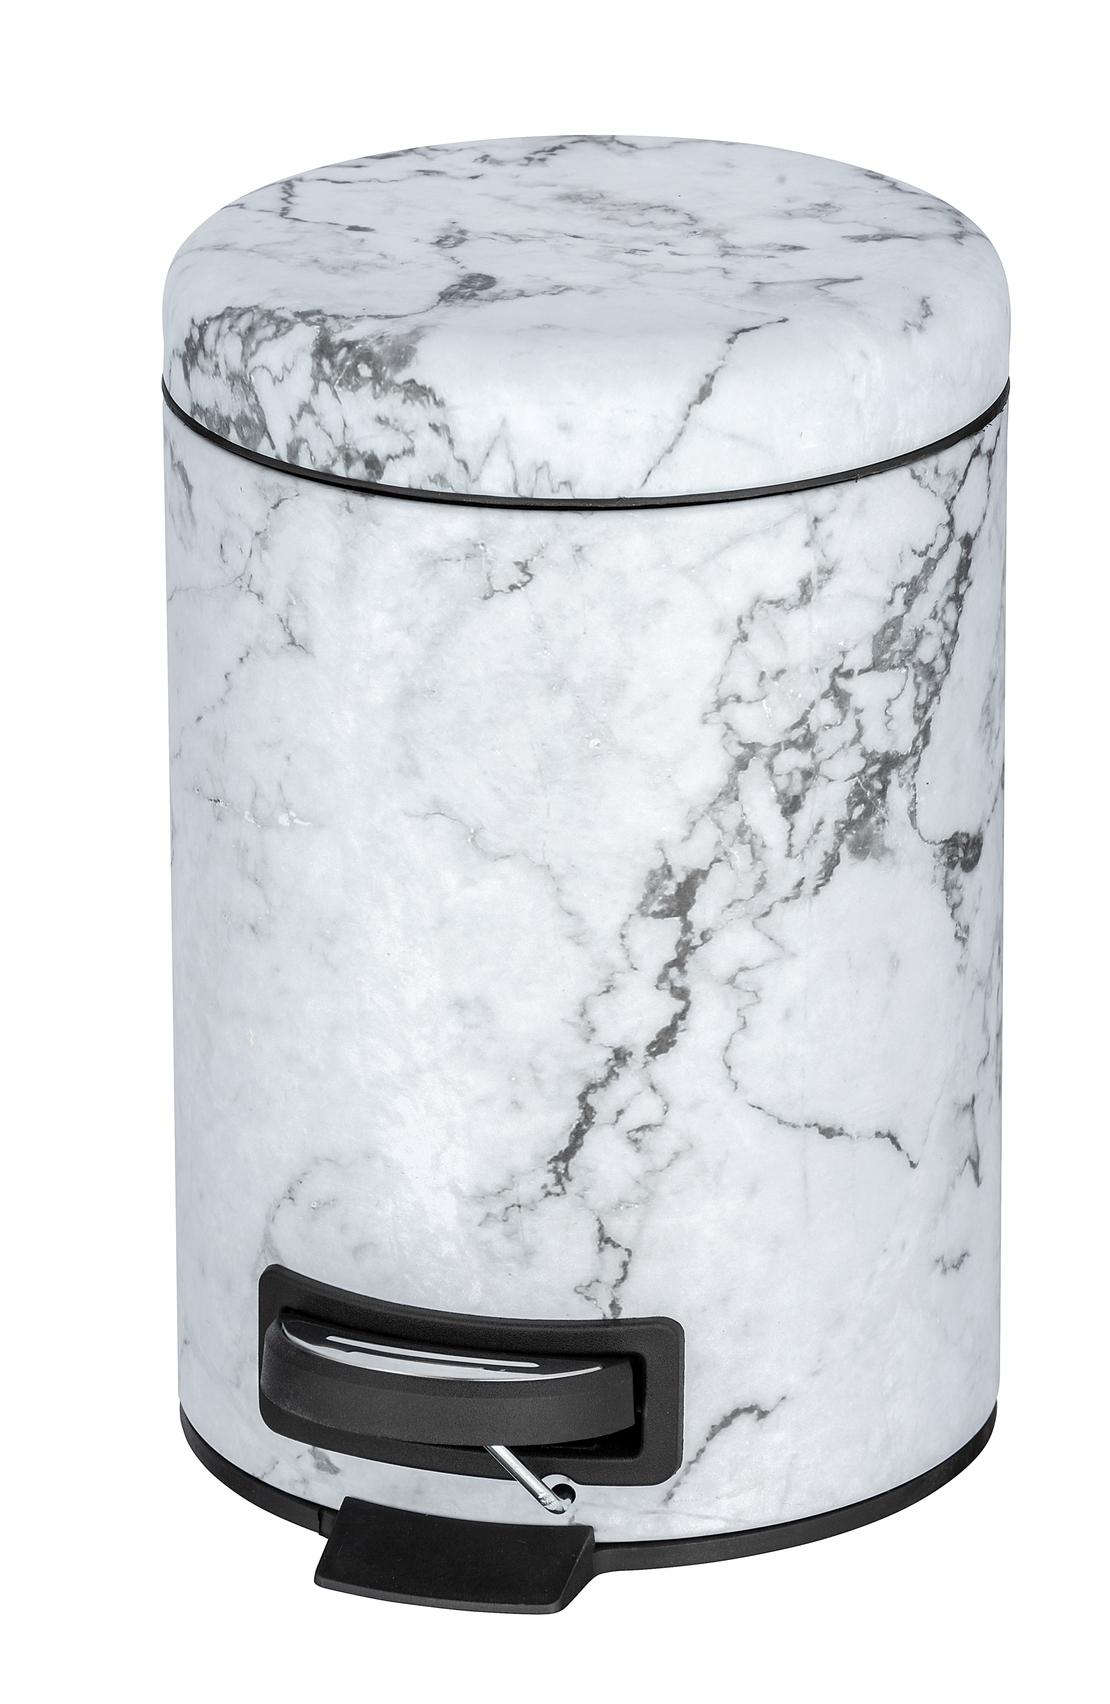 Cos de gunoi cu pedala, din otel inoxidabil, Onyx Alb / Negru, 3L, Ø17xH25 cm